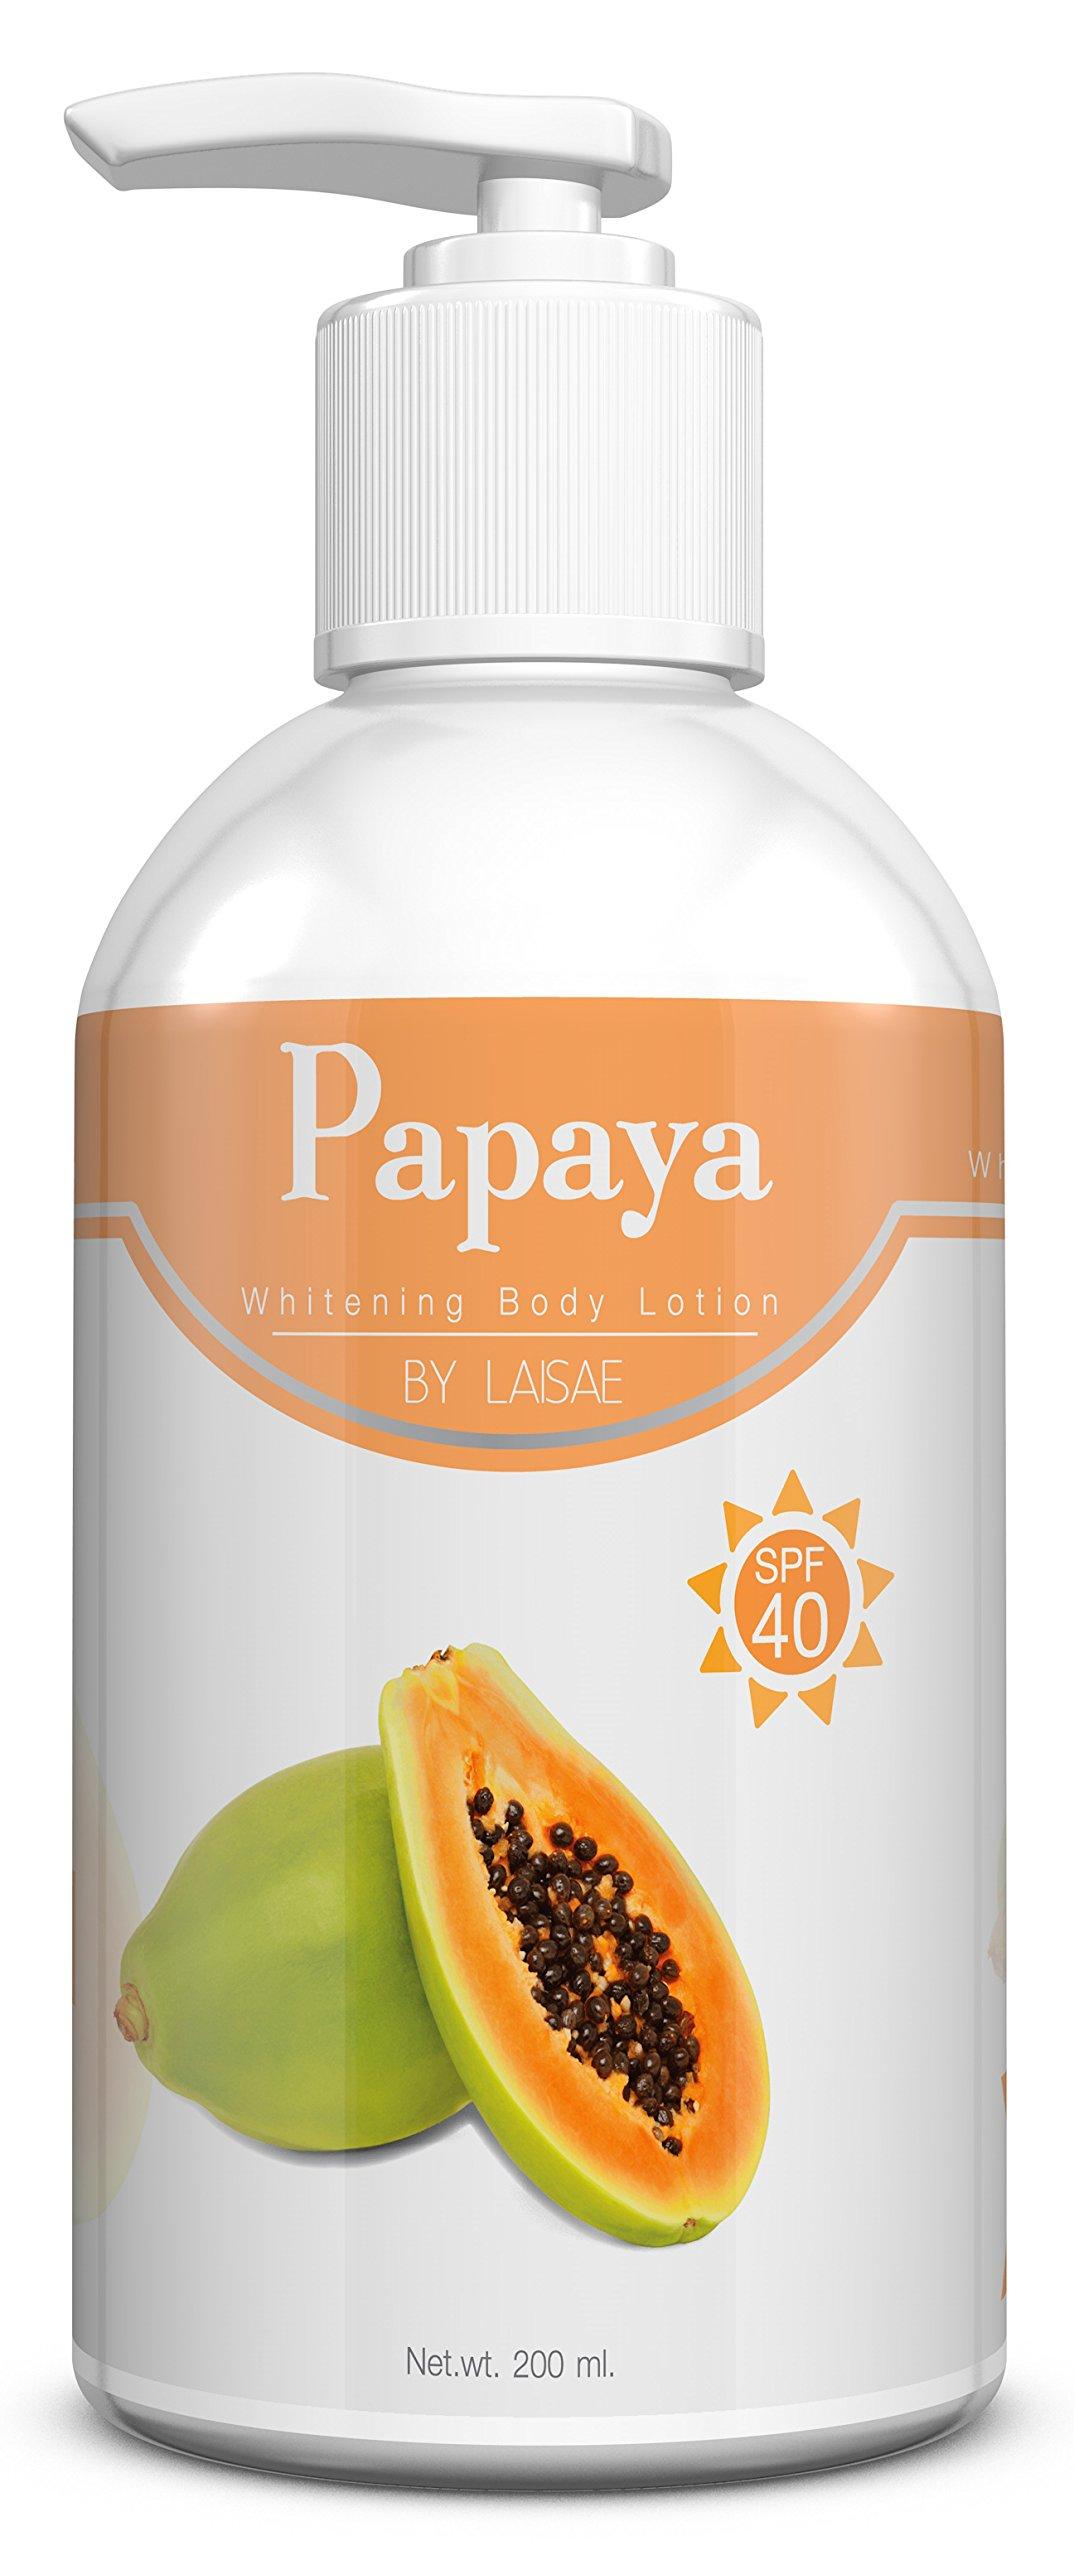 papaya whitening soap Original likas papaya skin whitening herbal soap 135g 34 out of 5 stars 37 £839 add to basket zooarts osmanthus essential oil handmade soap whitening 4 out of 5 stars 2 £499 add to basket asantee papaya & honey soap + q10 skin whitening 24 5 out of 5 stars 1 £3479.